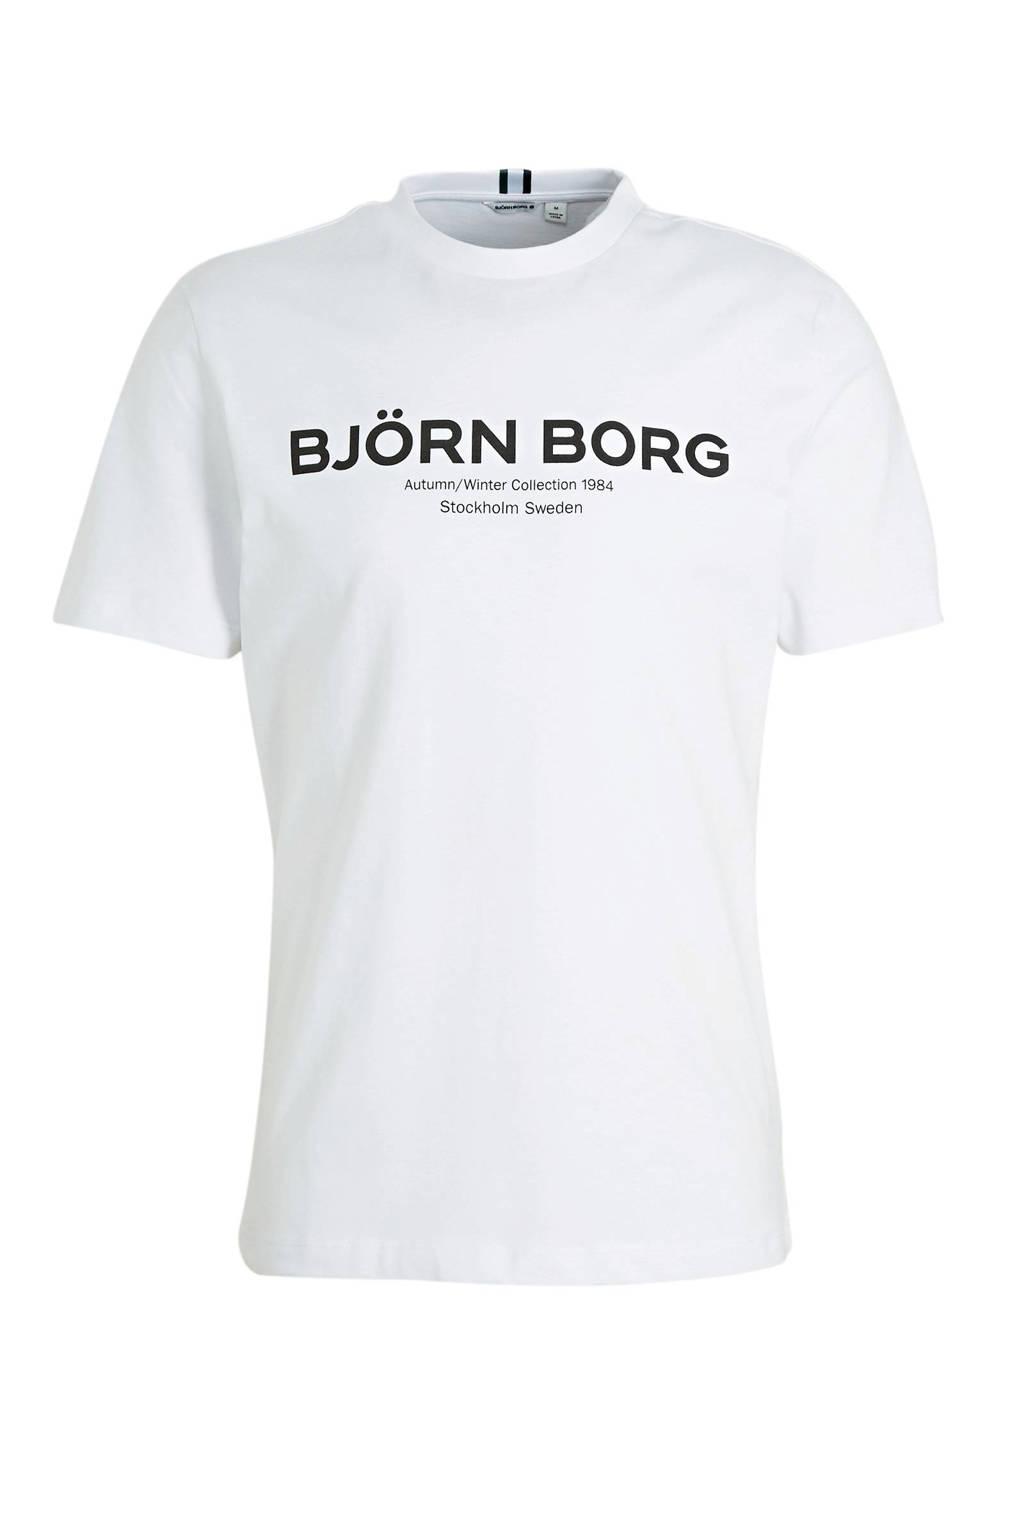 Björn Borg T-shirt wit, Wit